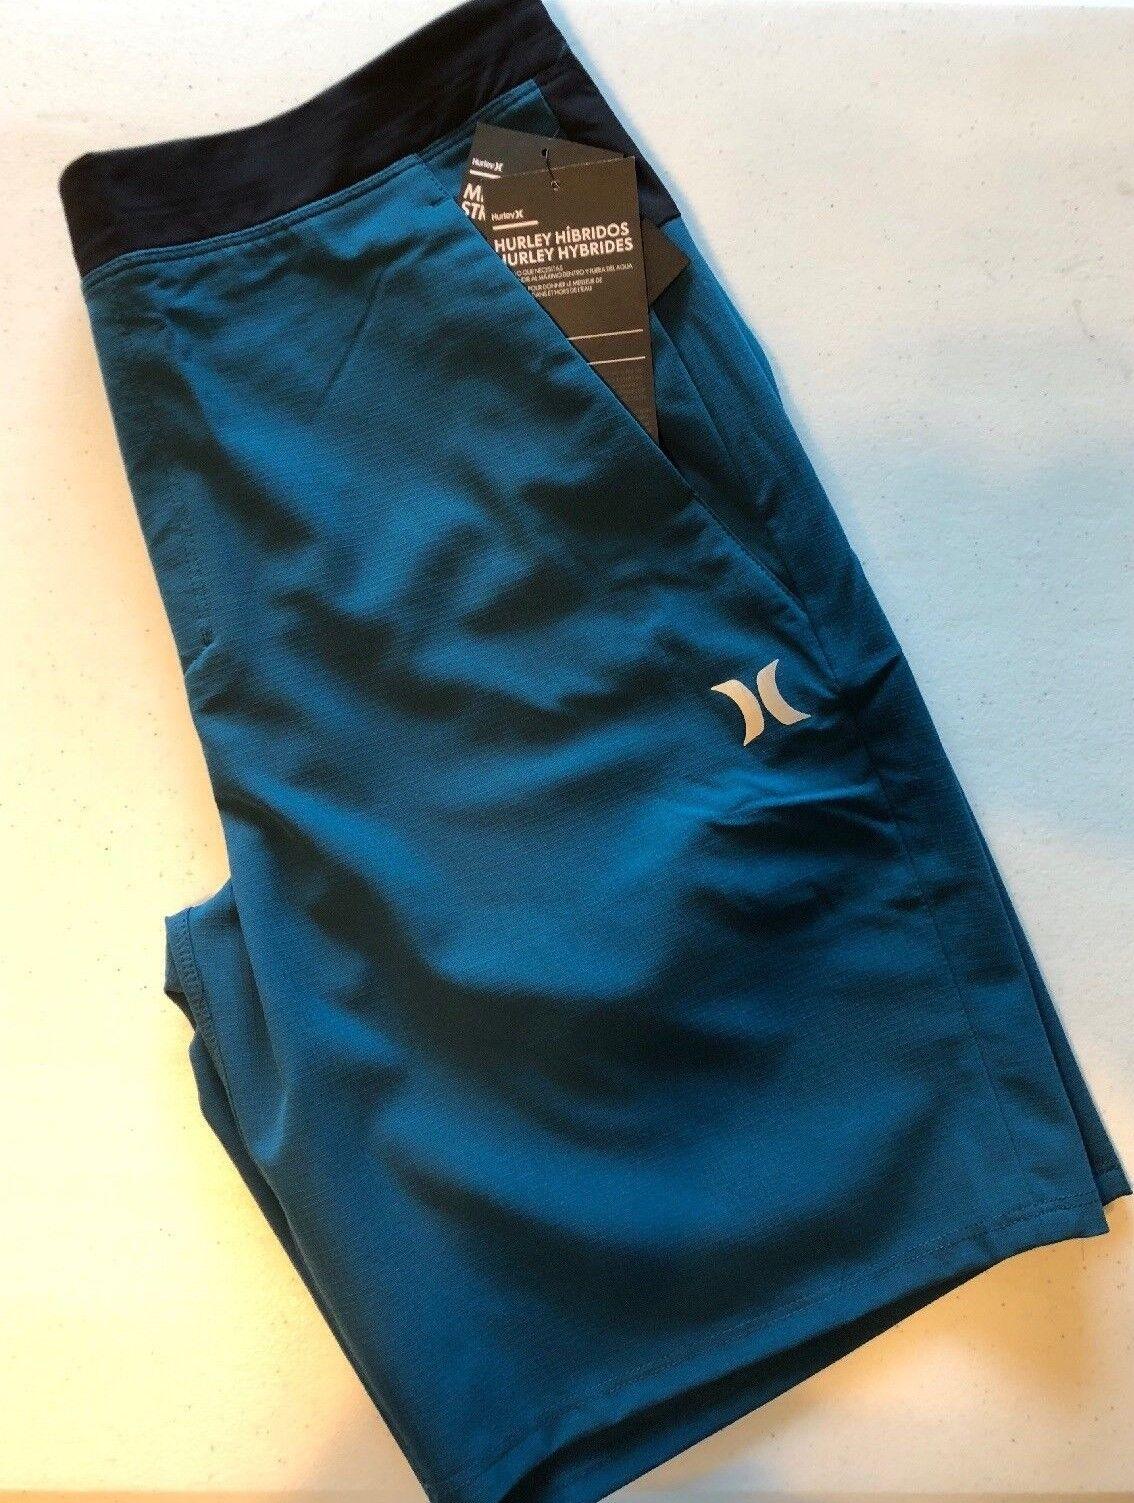 Hurley Men's S L XL Alpha Trainer Hybrids 20.5  Walk shorts MWS0005340 4CN bluee